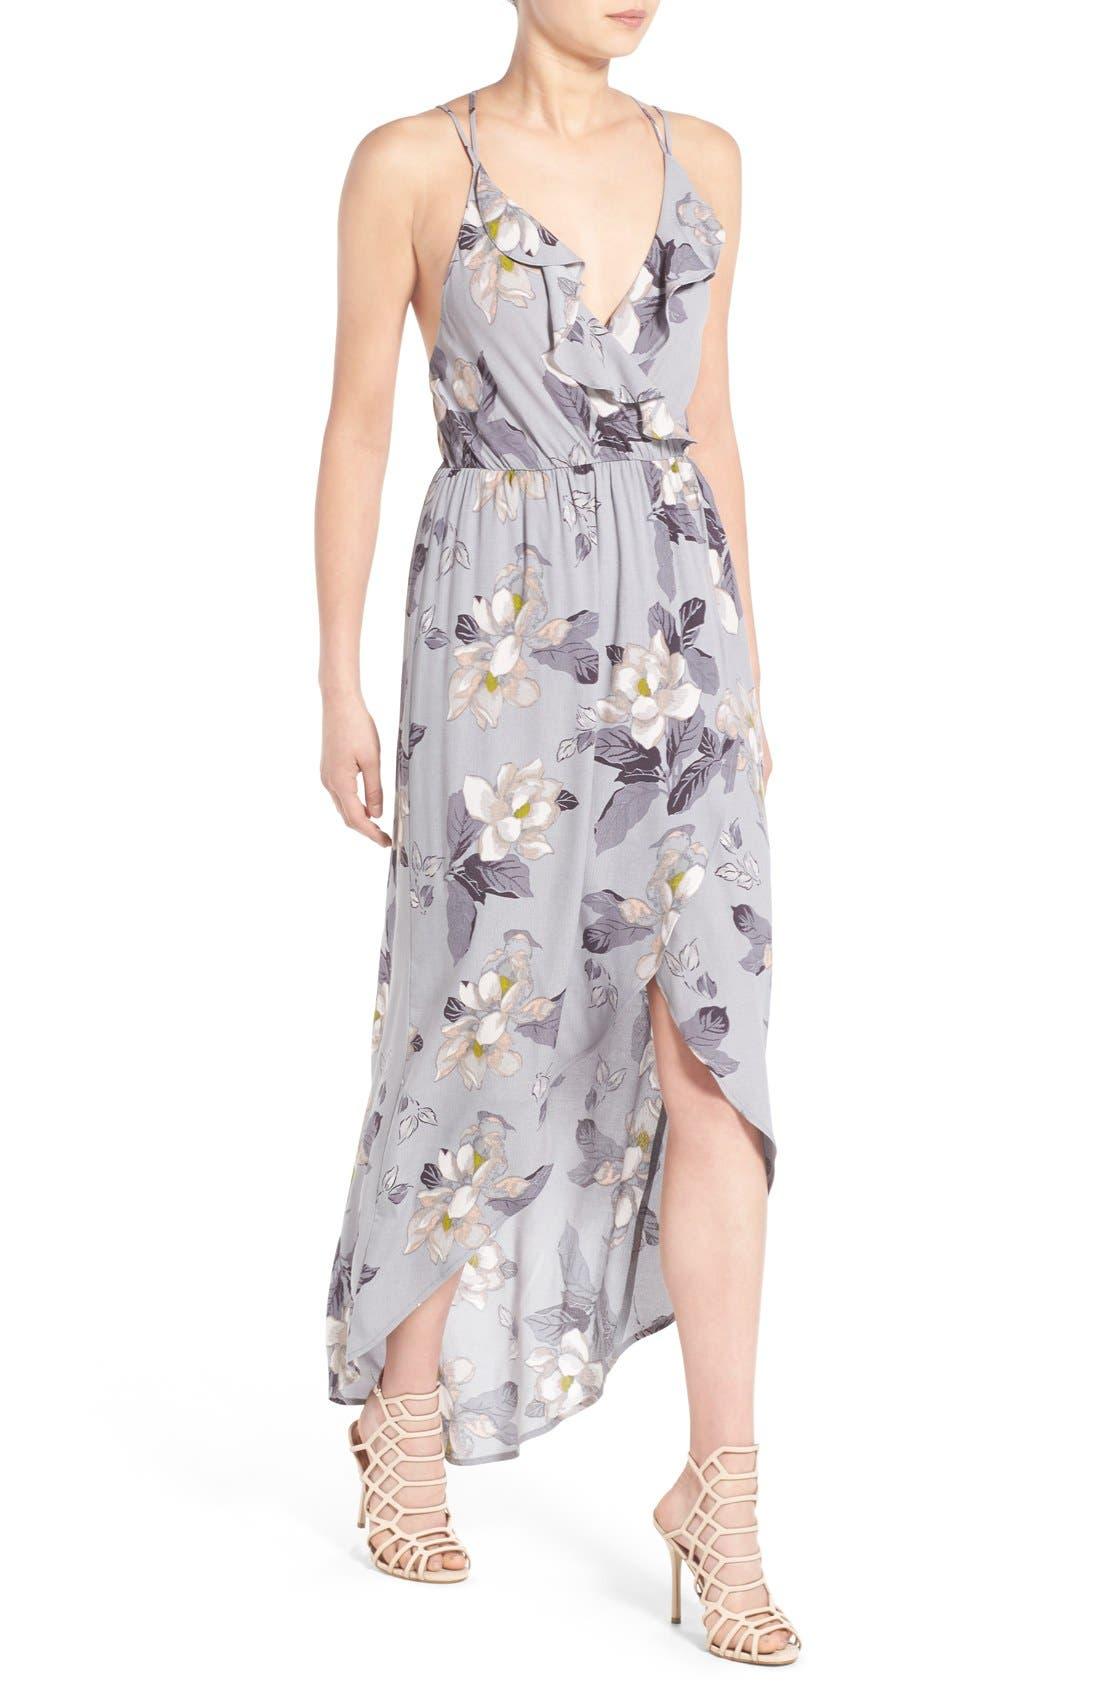 ASTR Ruffle Surplice High/Low Maxi Dress,                             Alternate thumbnail 4, color,                             Grey Multi Floral